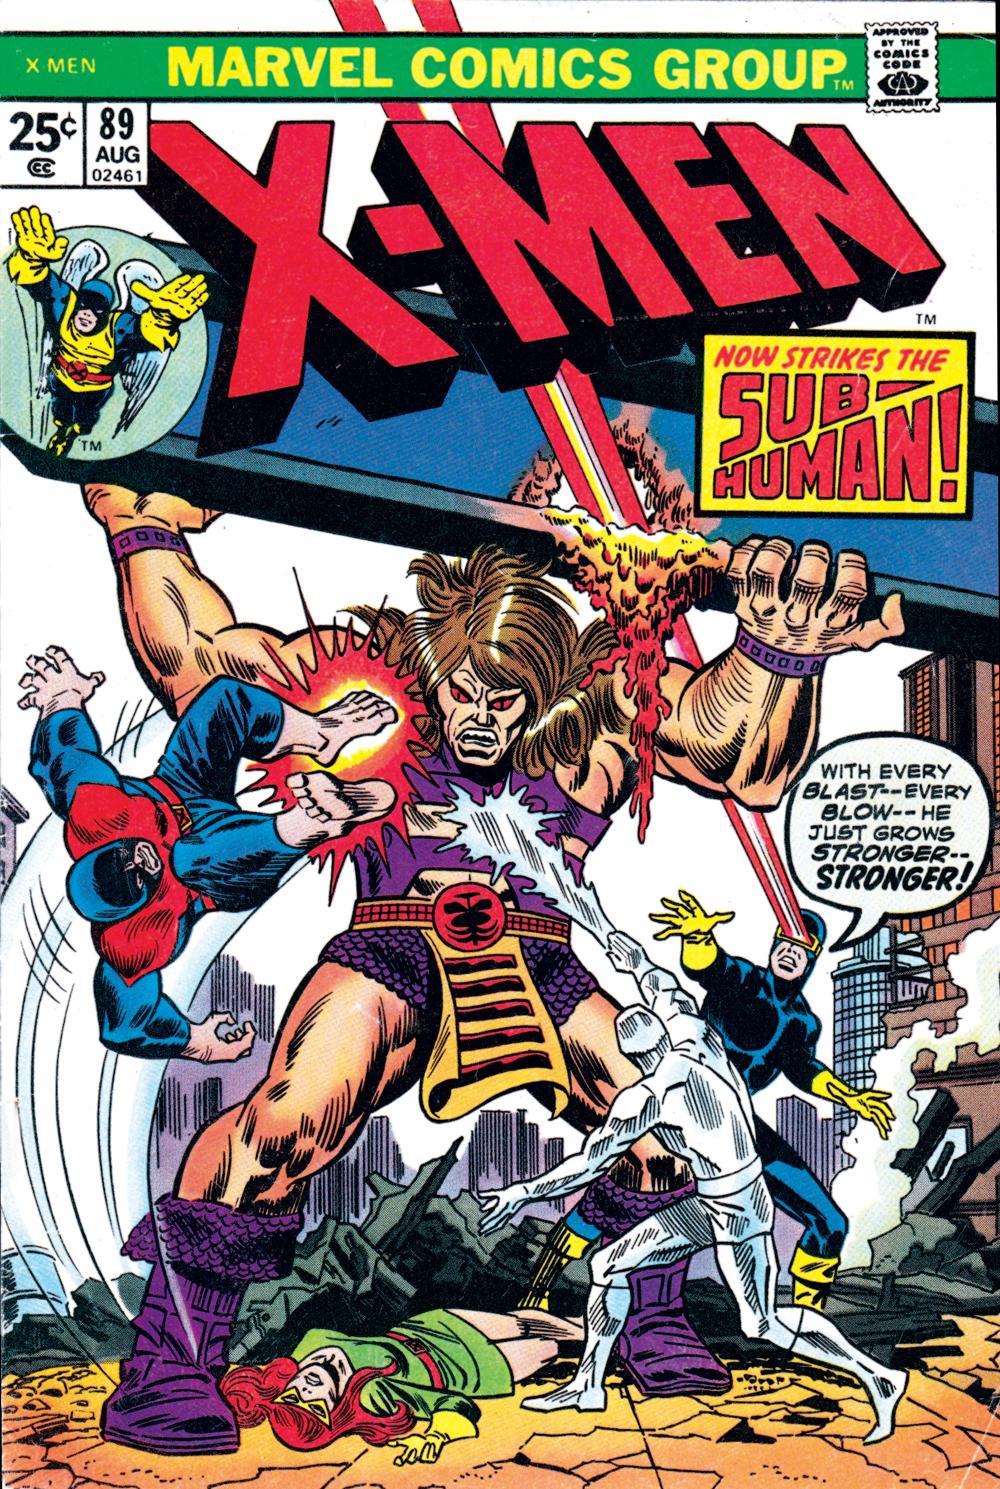 Uncanny X-Men (1963) #89